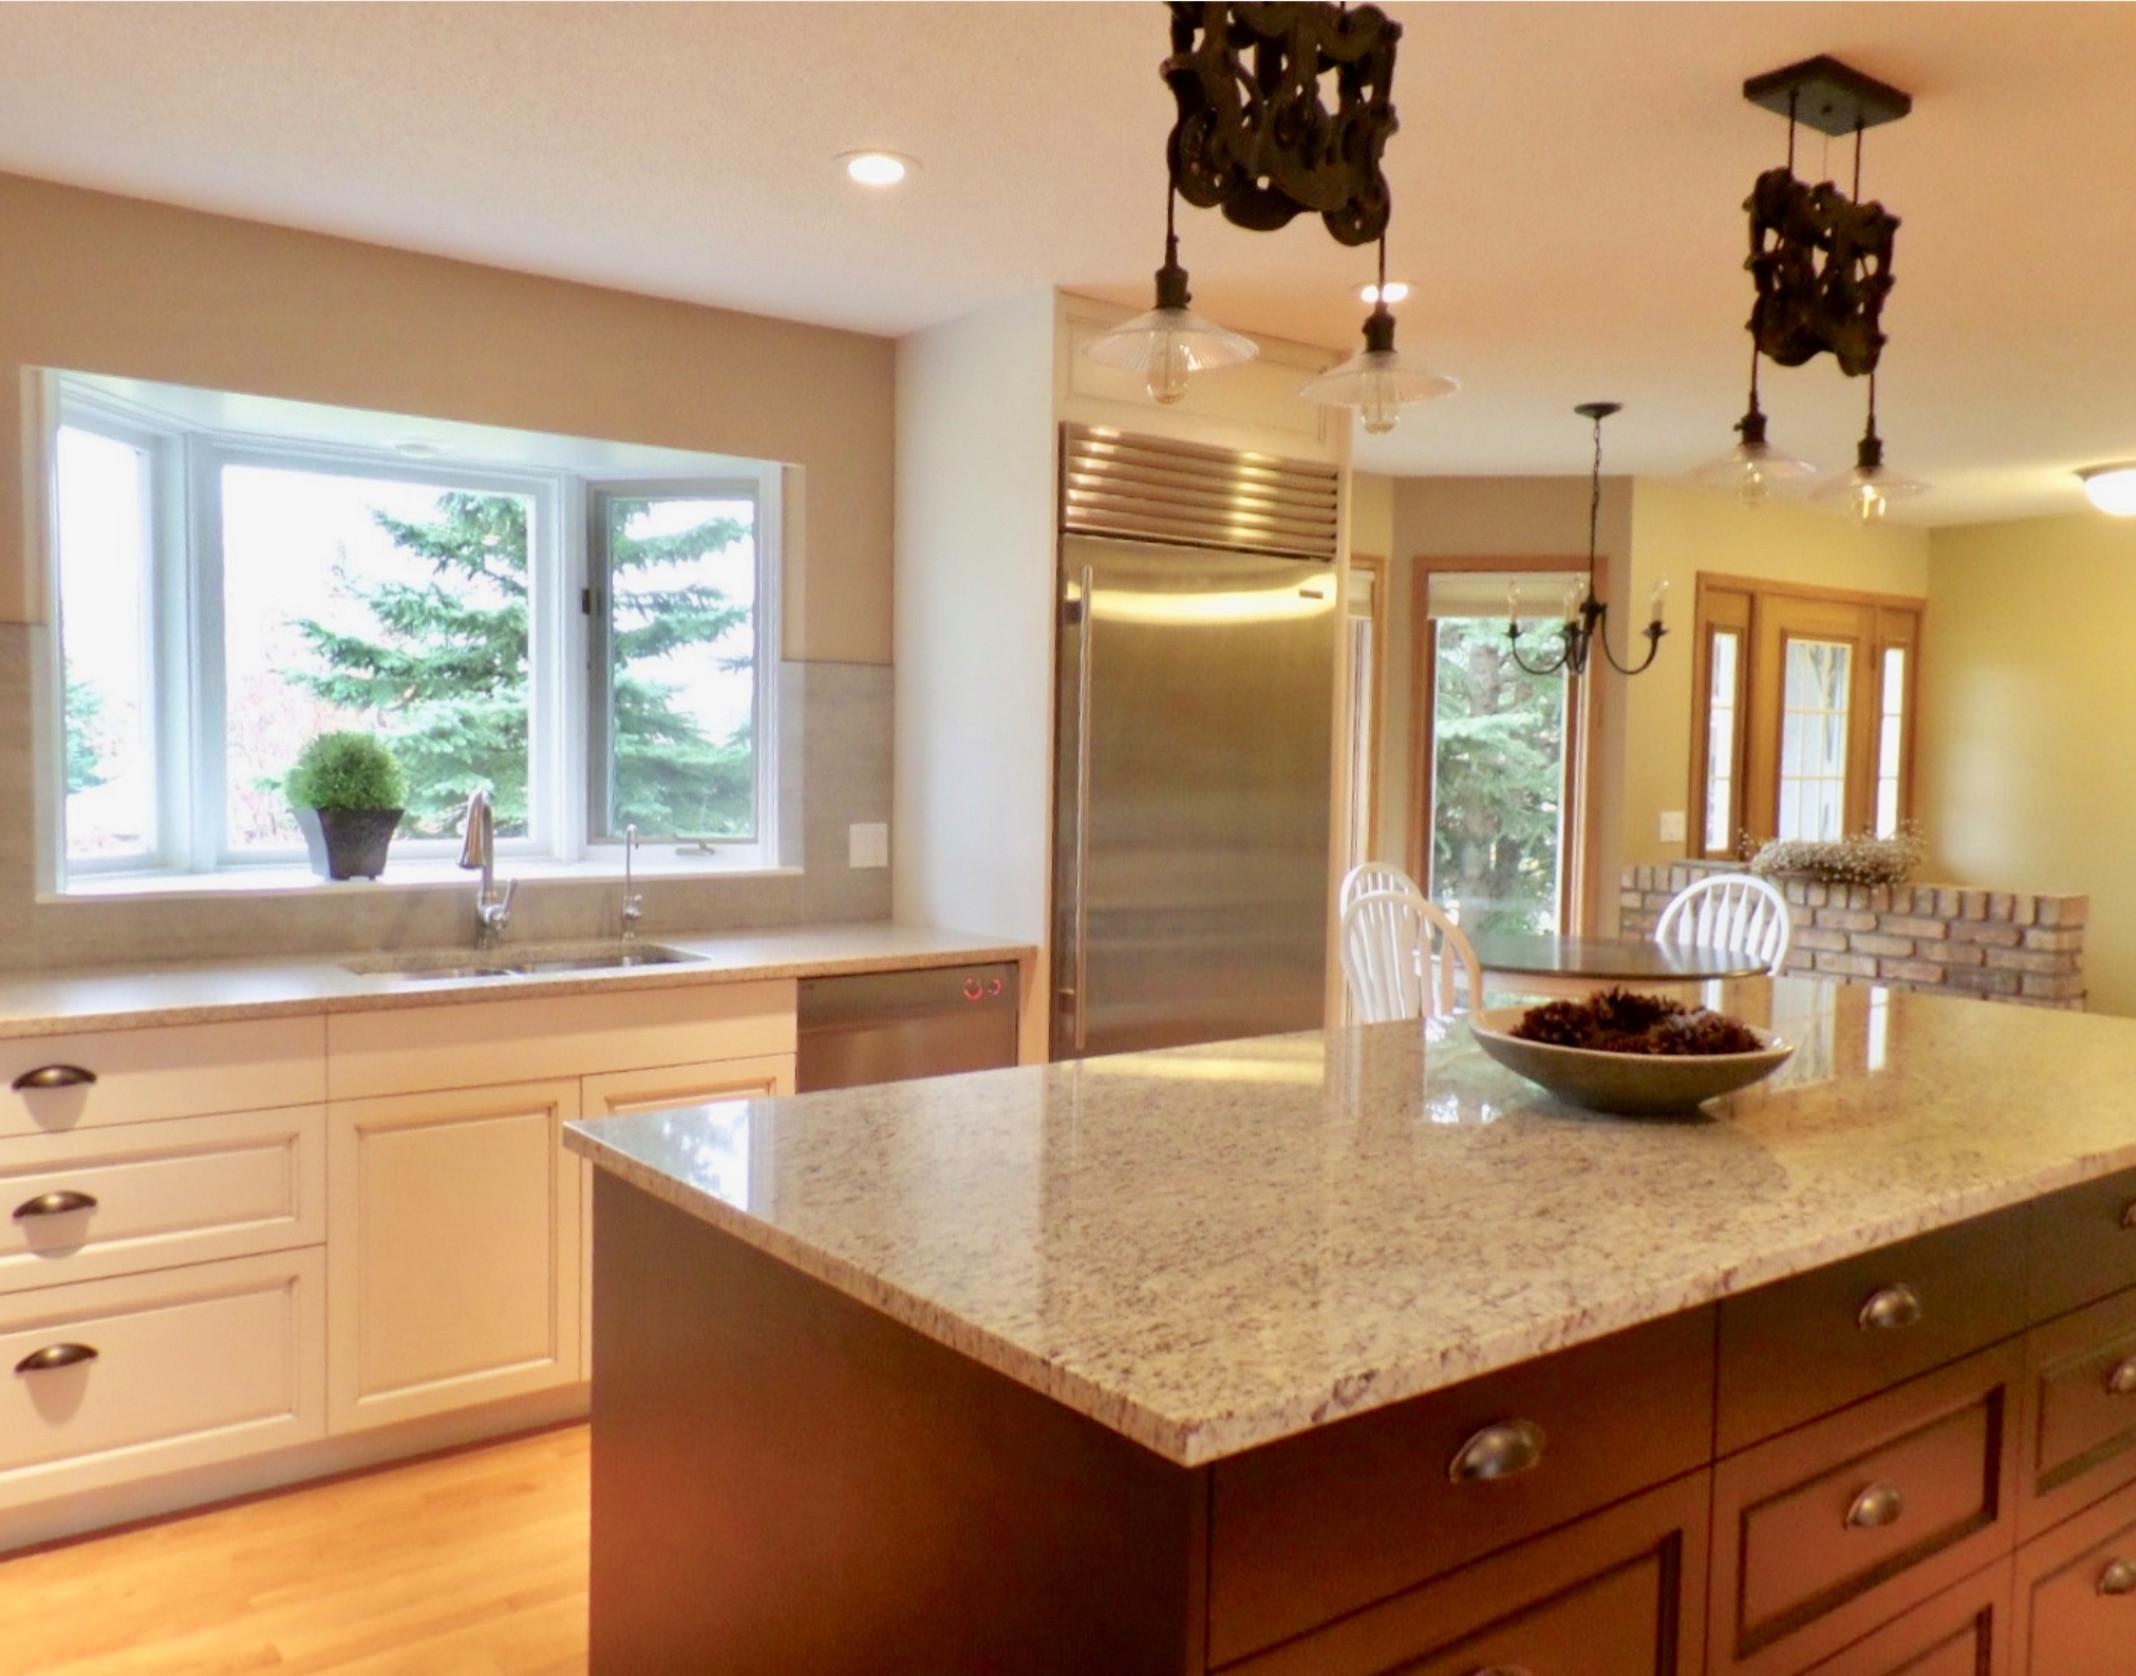 Modern Rustic Kitchen Revovation